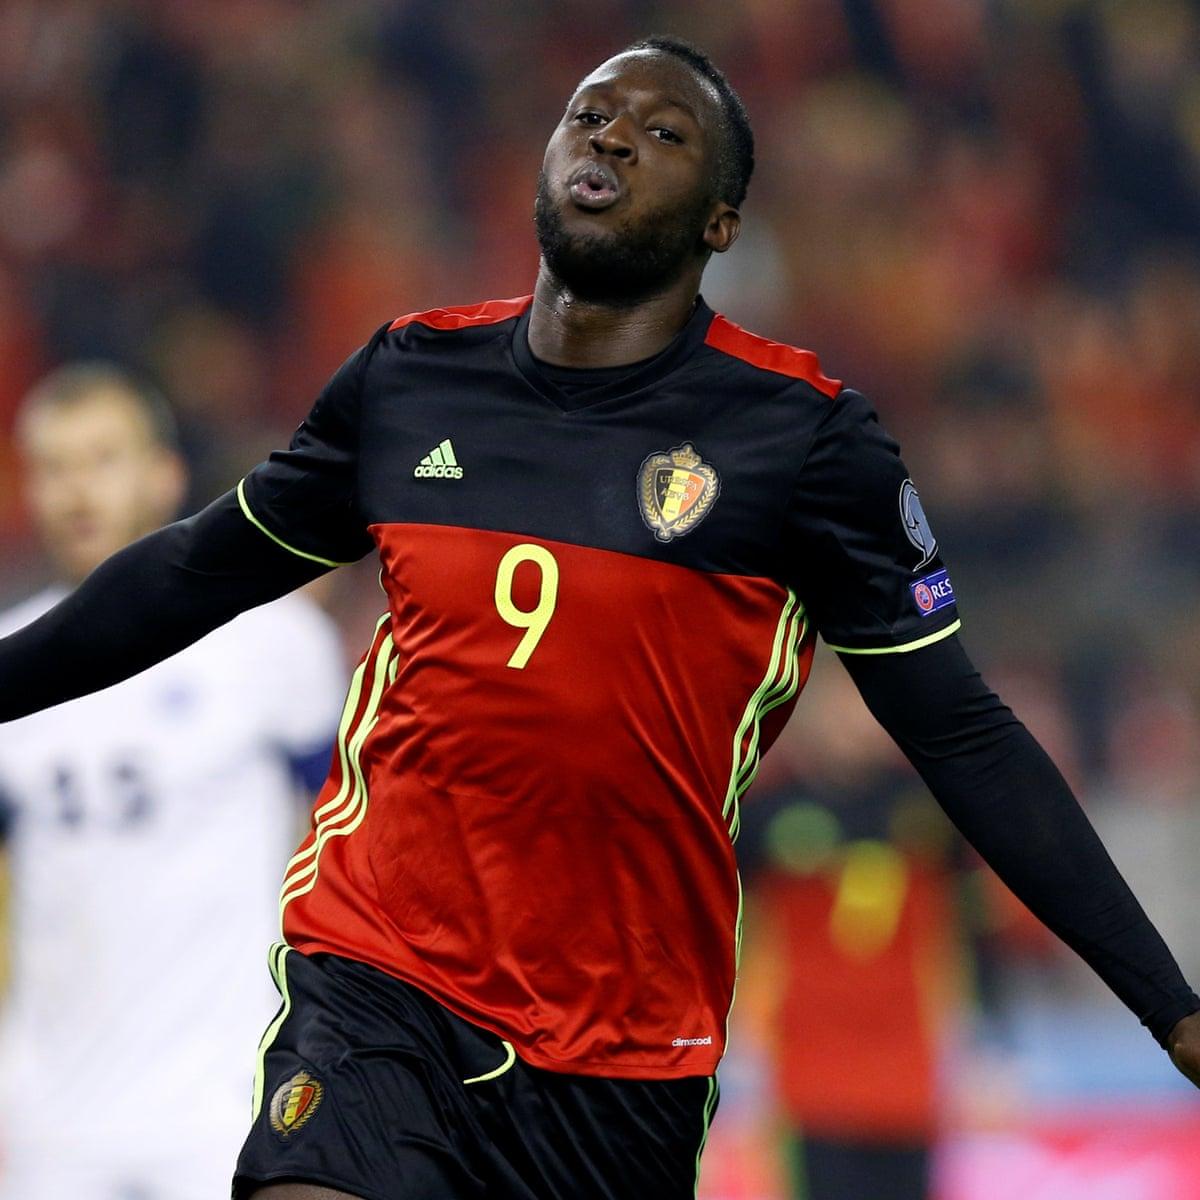 Romelu Lukaku On Target As Belgium Hit Estonia For Eight In Qualifier World Cup 2018 Qualifiers The Guardian